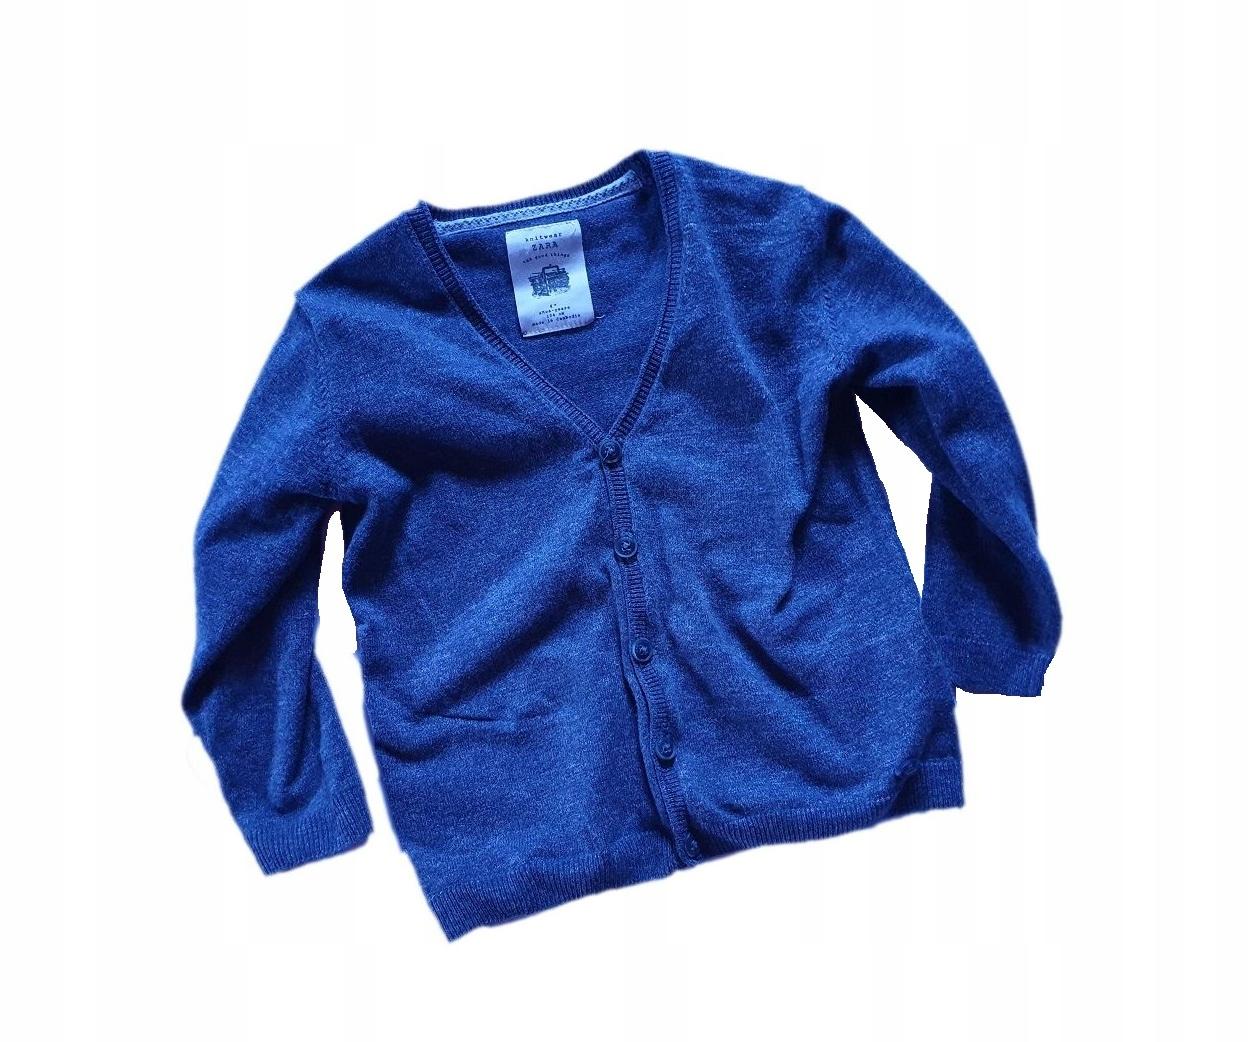 ZARA wiosenny sweterek na guziki 104 cm